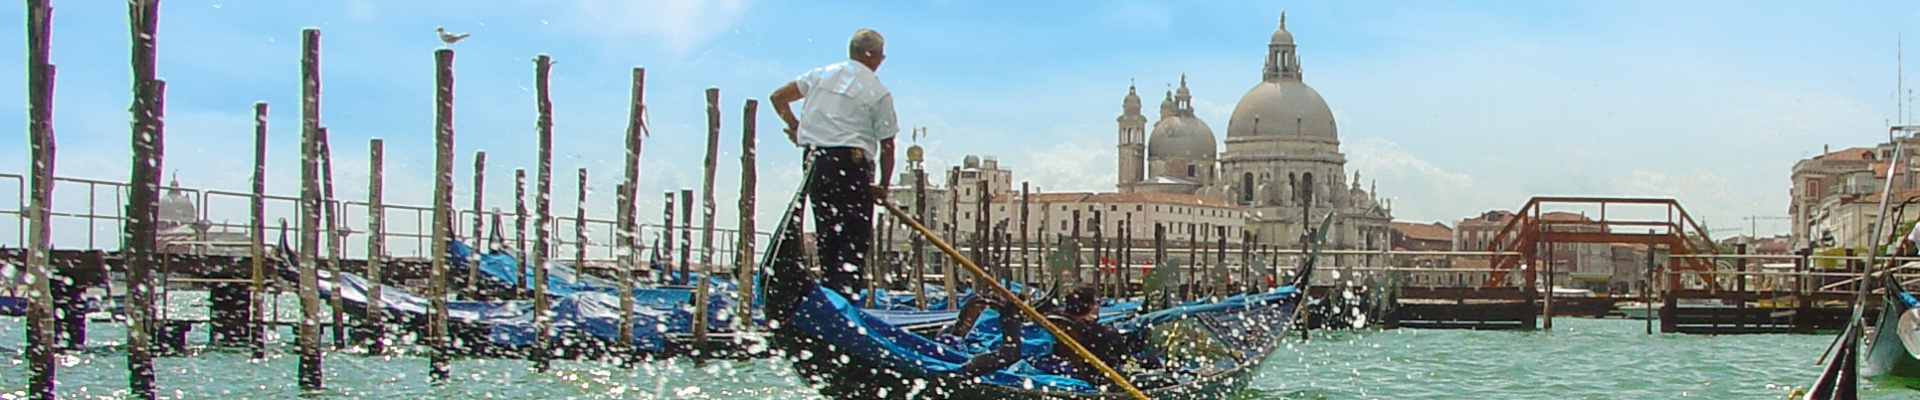 Discover...<br/>Venice